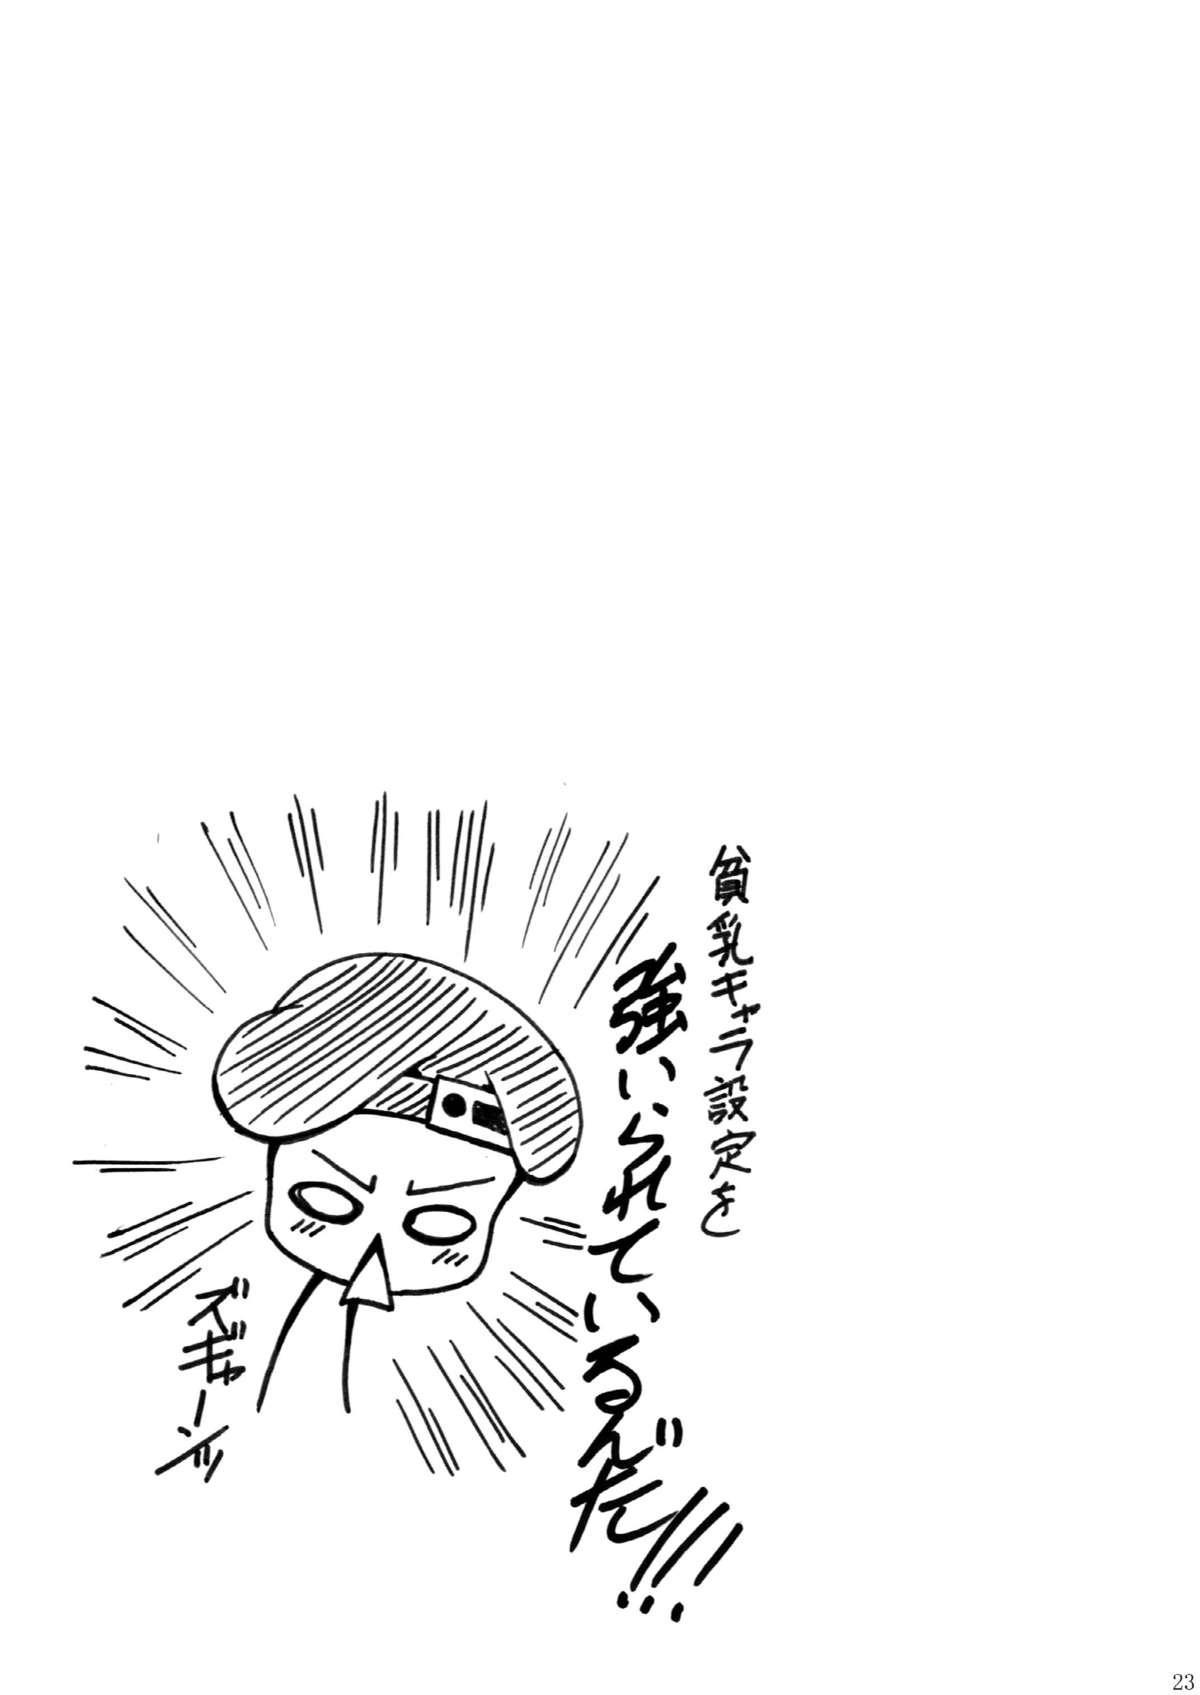 Ran ☆ Bato - Round 1 21